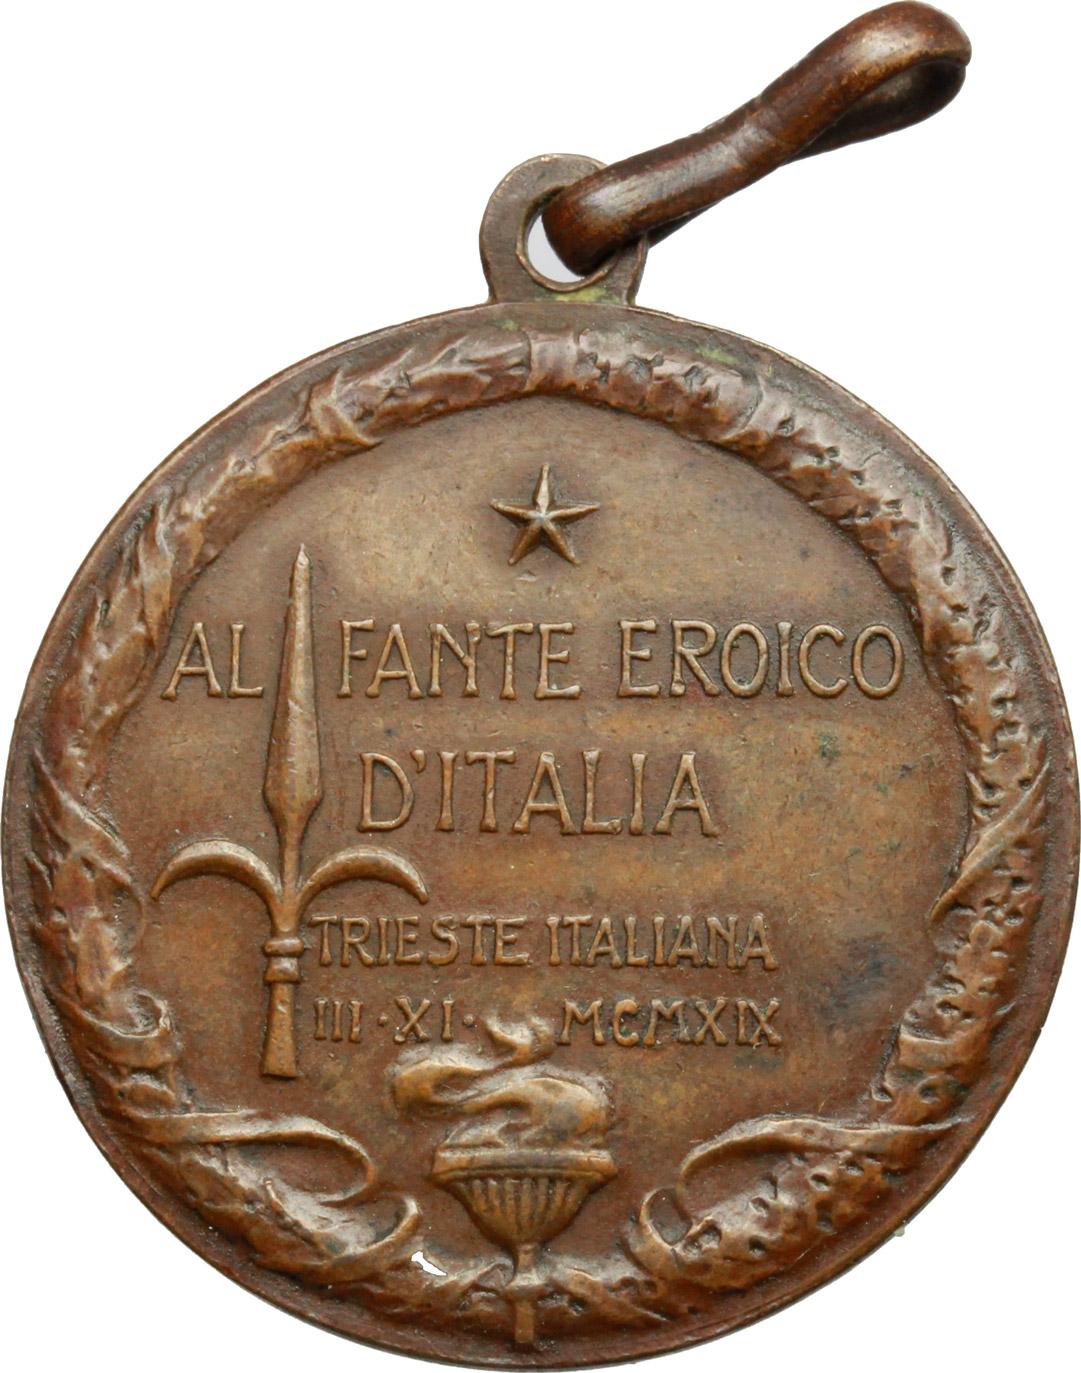 R/  Medaglia al Fante eroico d'Italia. Trieste italiana. III-XI-MCMXIX.     AE.   mm. 28.50    Bel BB.